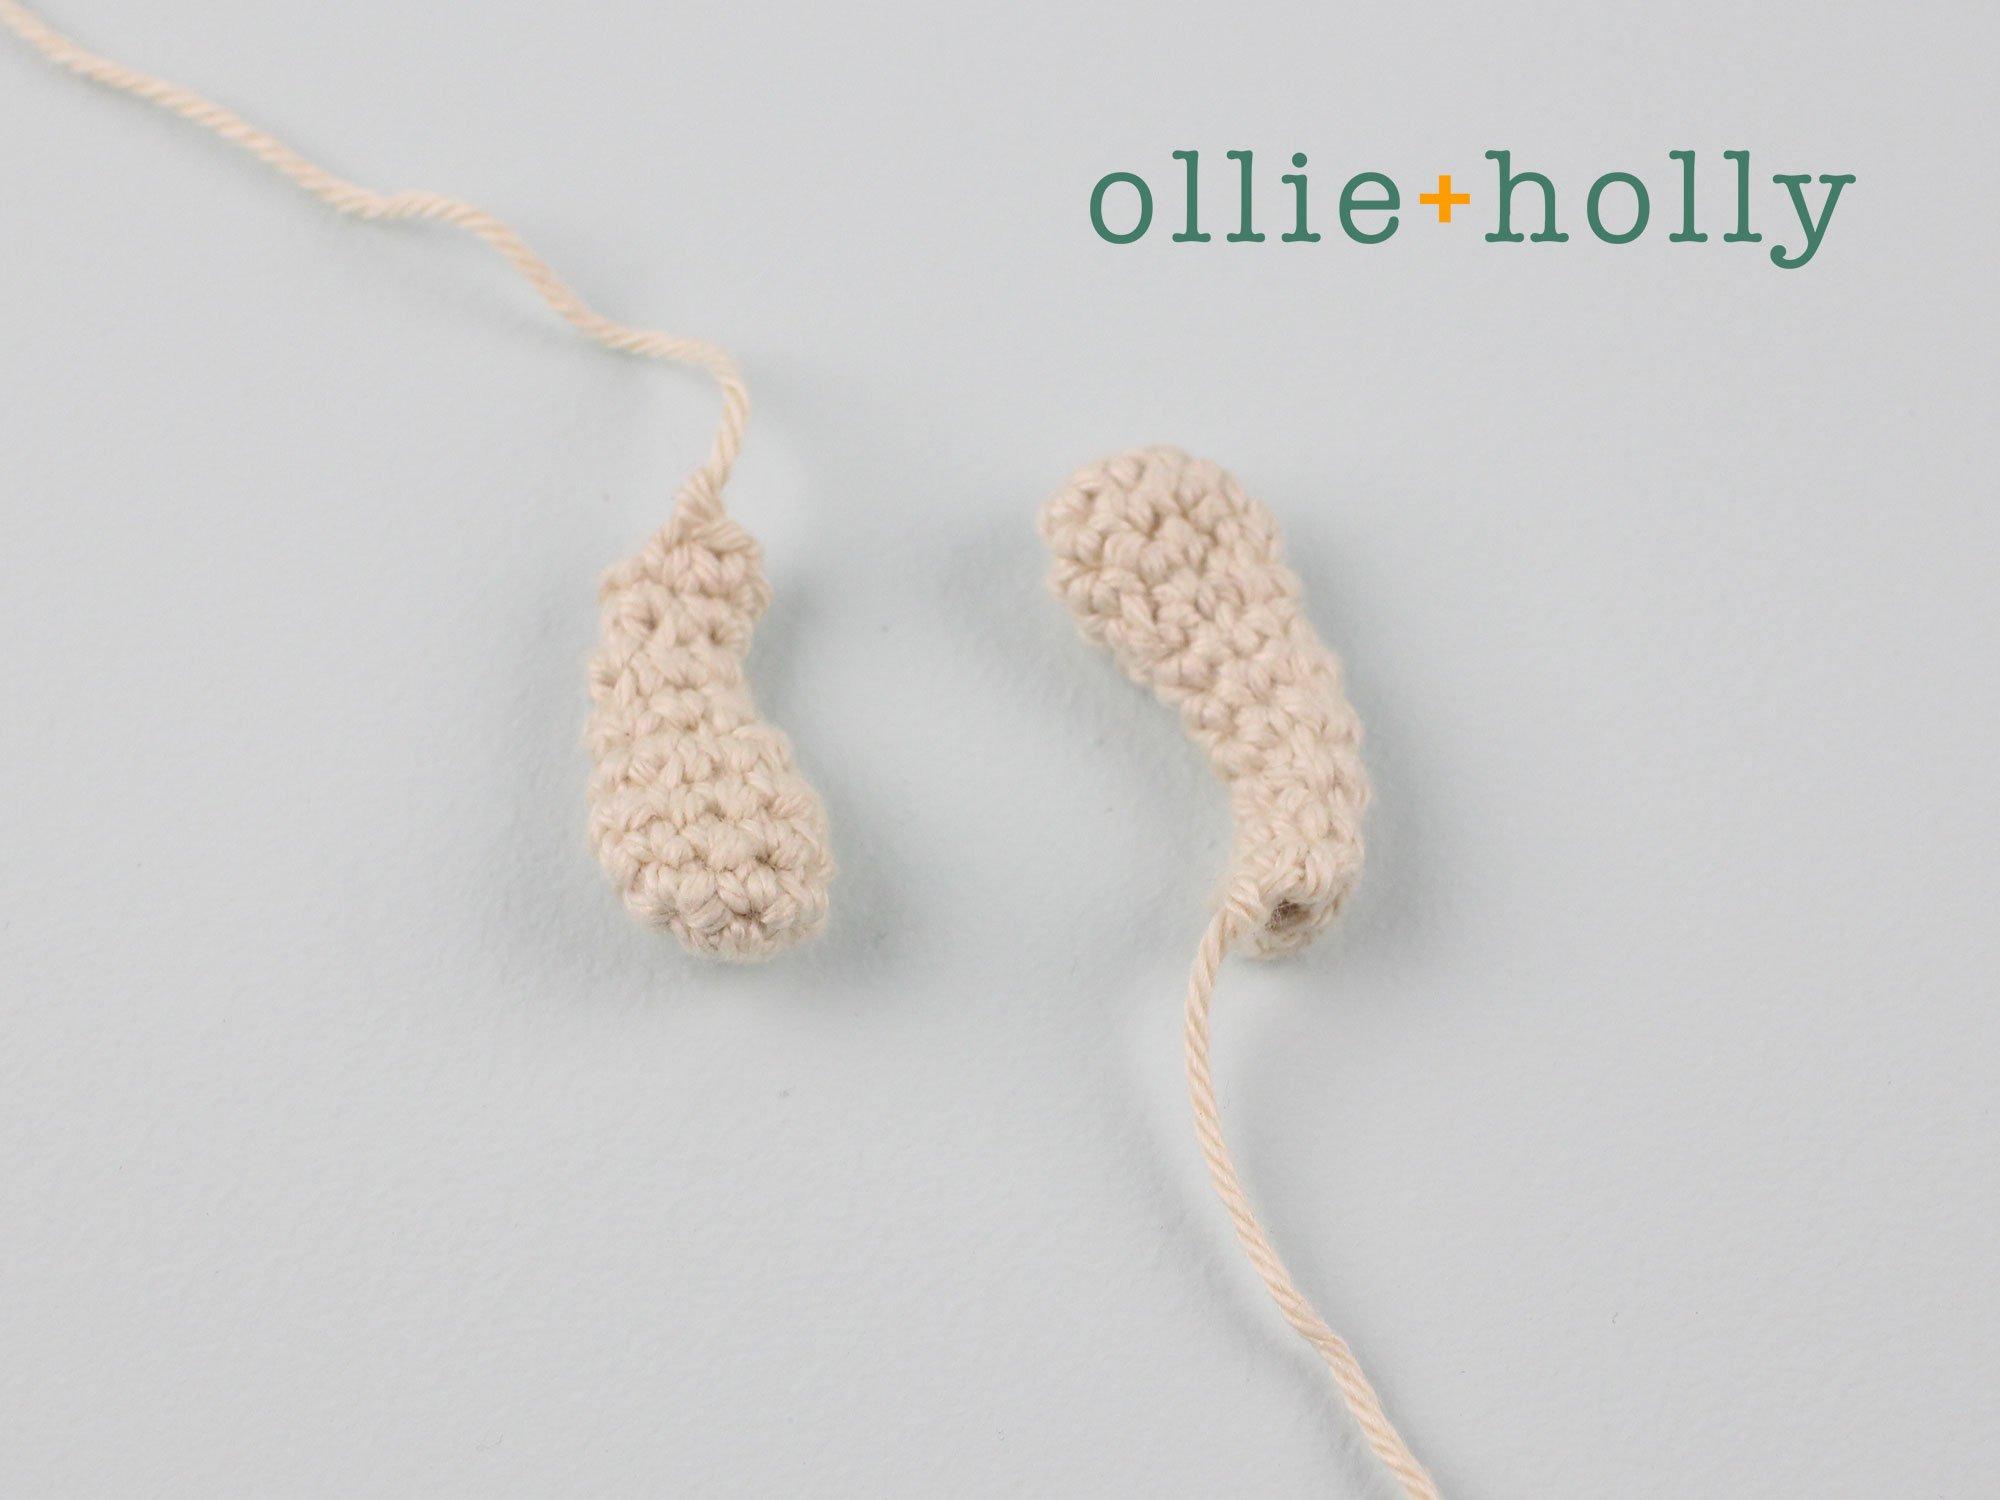 Free Maneki Neko Lucky Cat Amigurumi Crochet Pattern Step 8